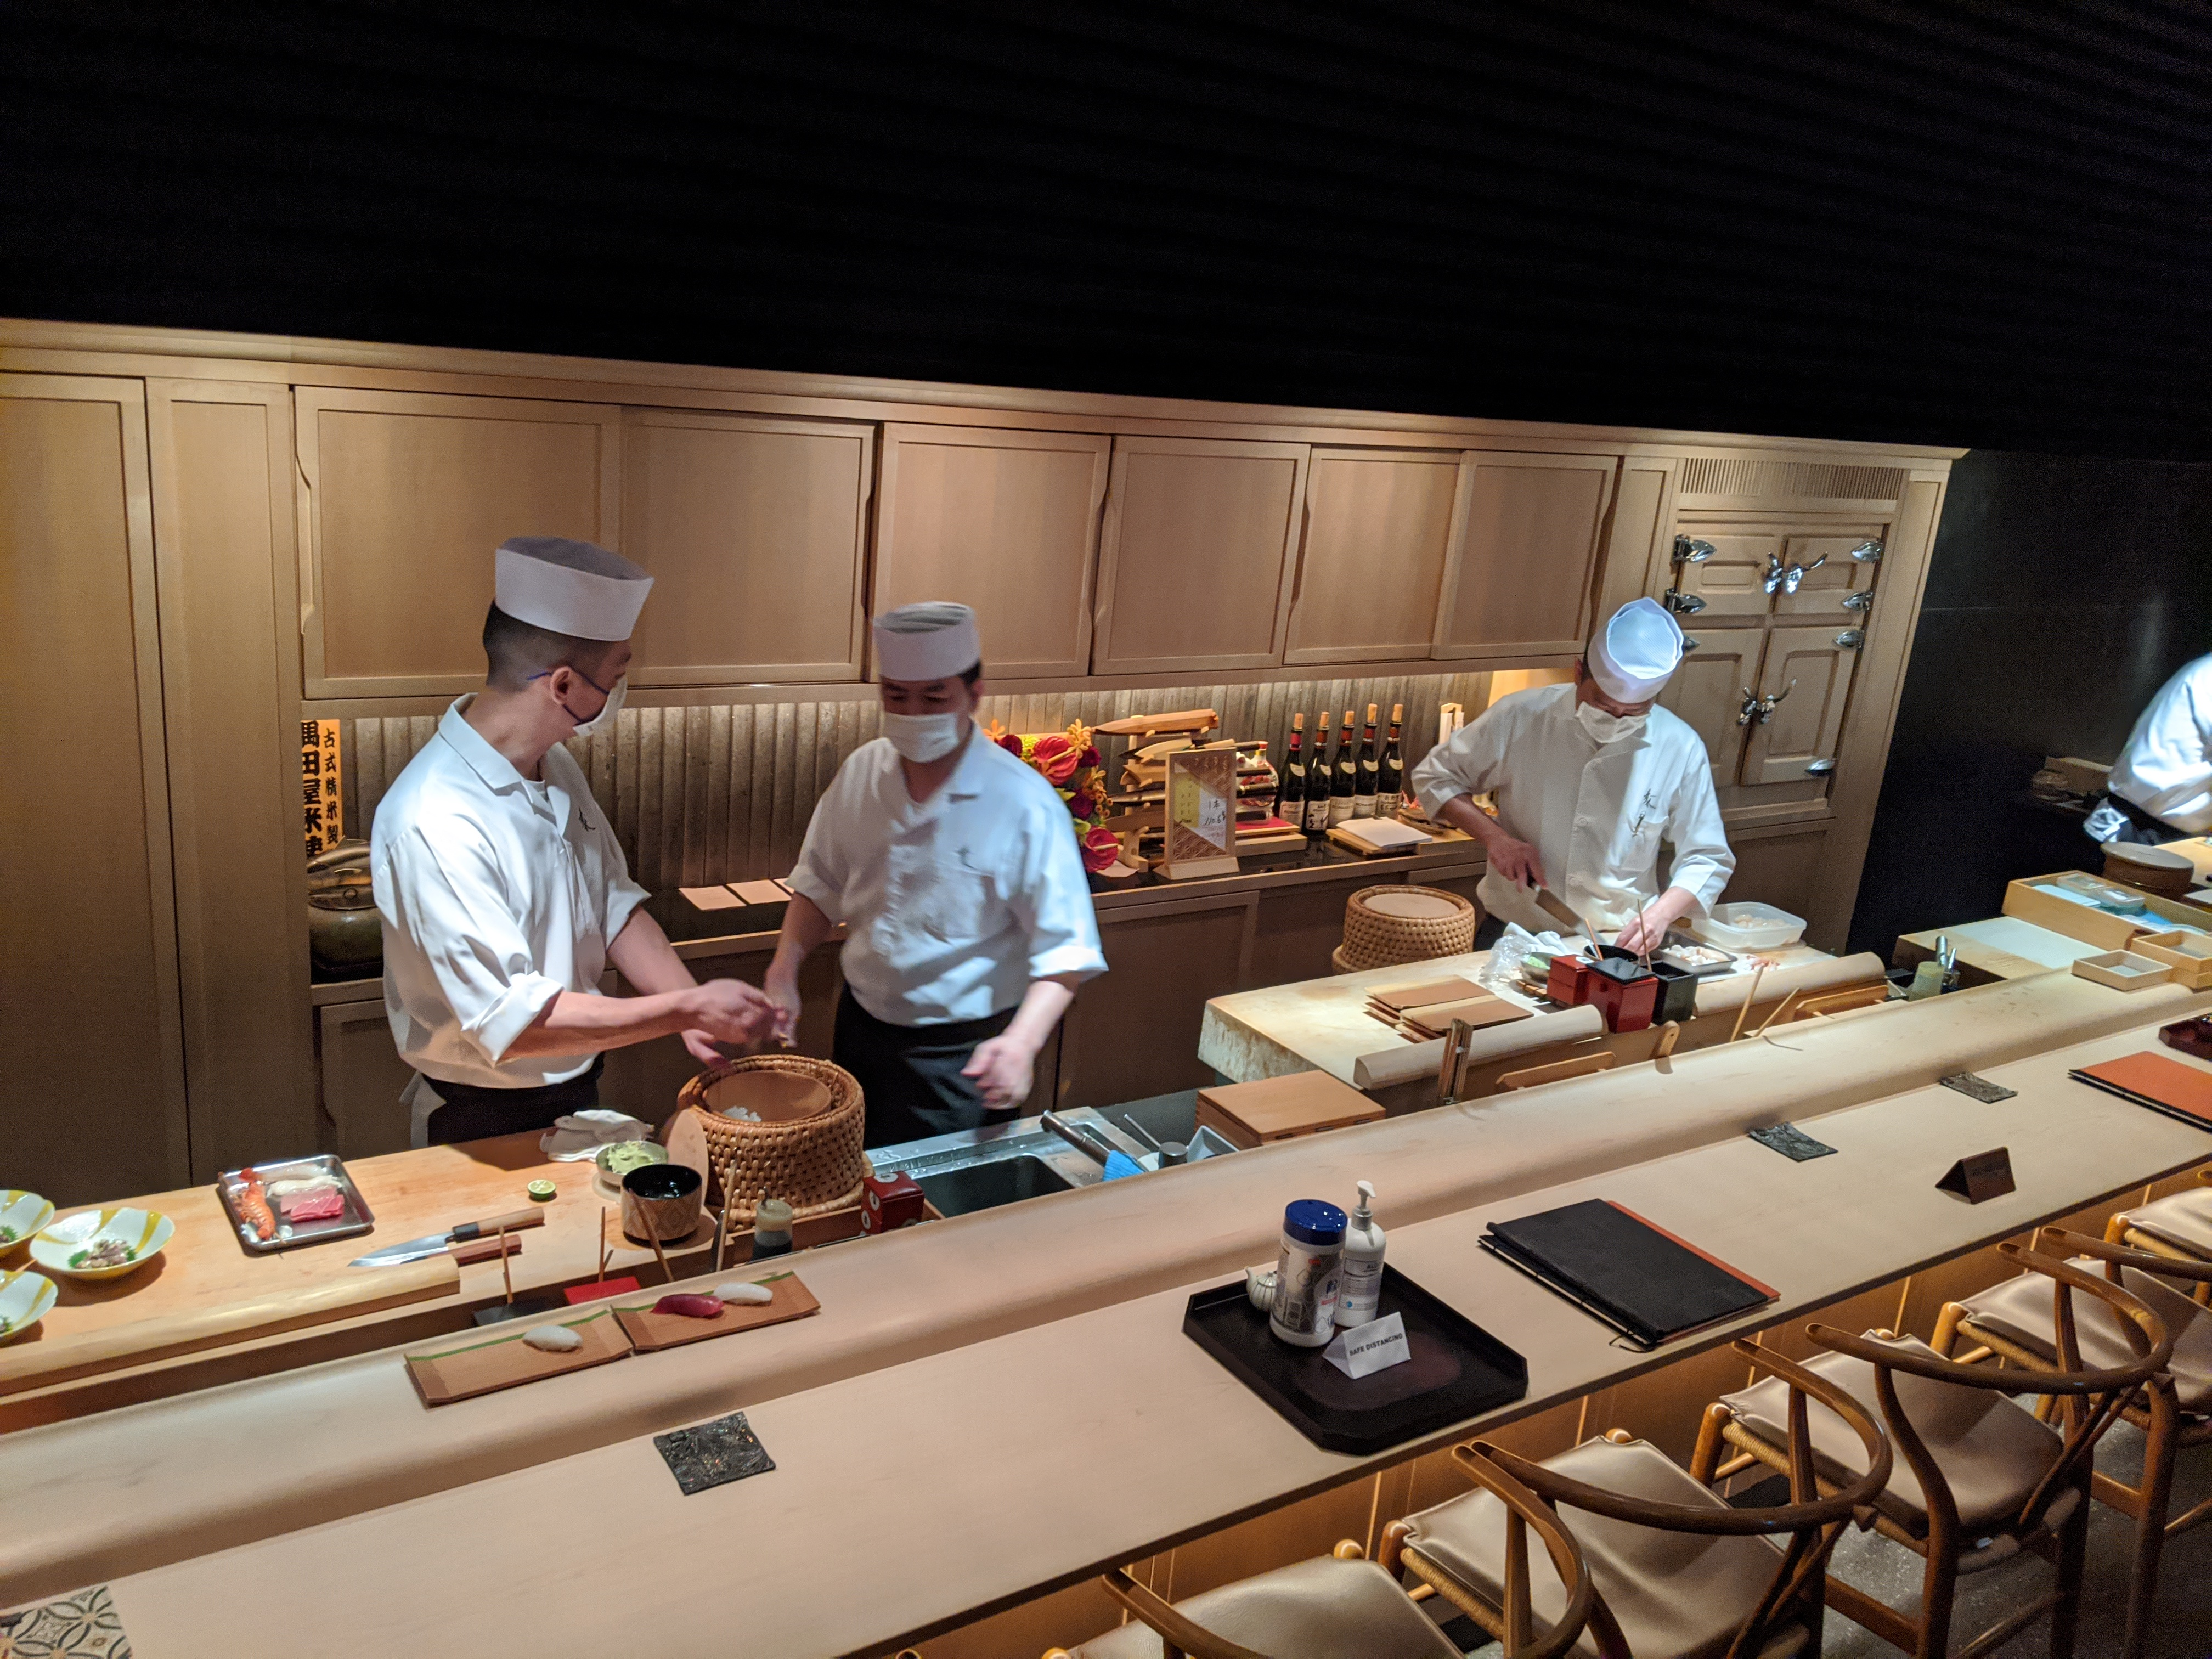 aoki singapore omakase sushi eateries to visit near Orchard Shaw Centre